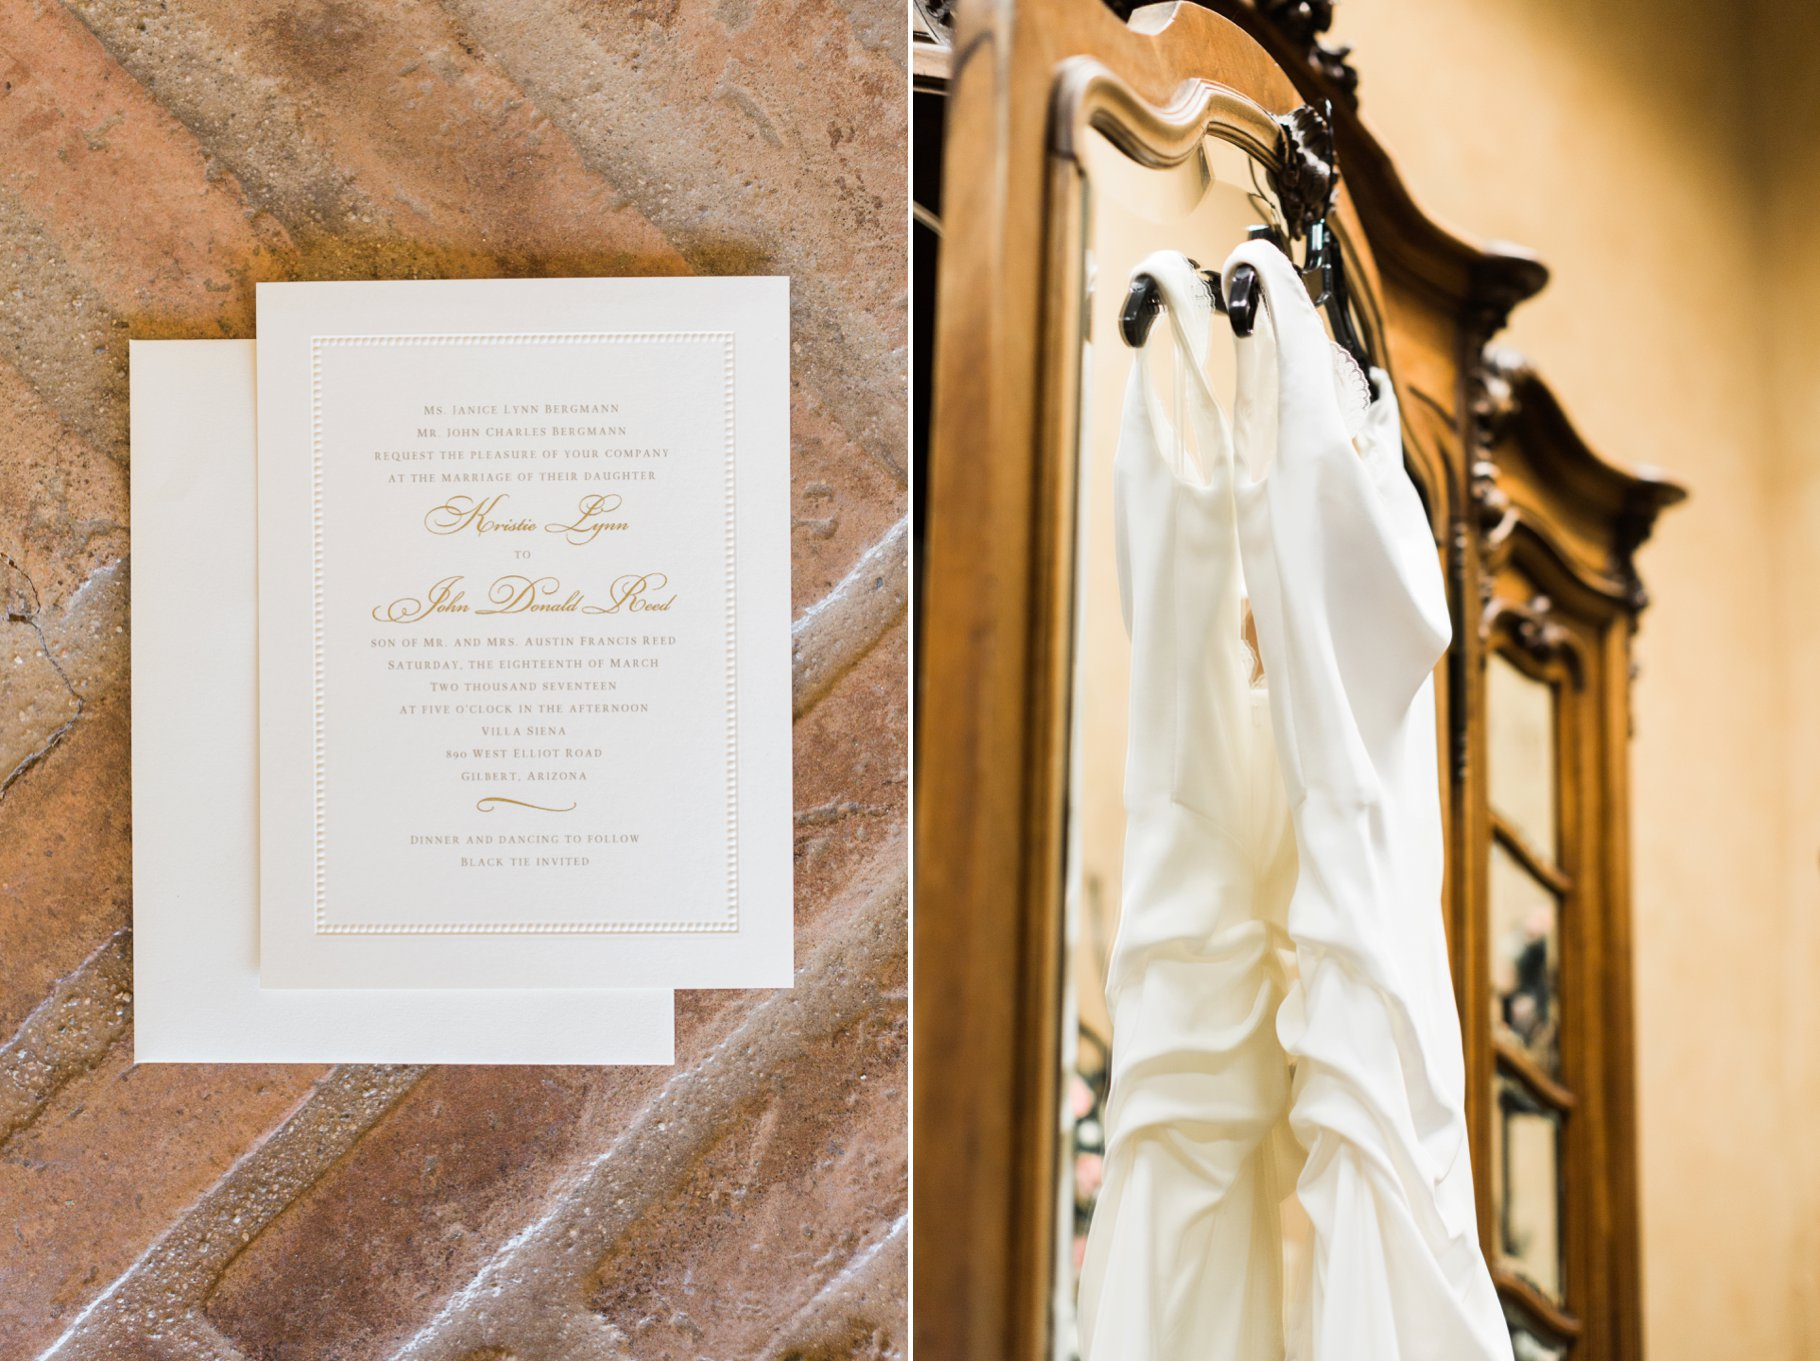 villa siena wedding-001_GRETCHEN WAKEMAN PHOTOGRAPHY.jpg